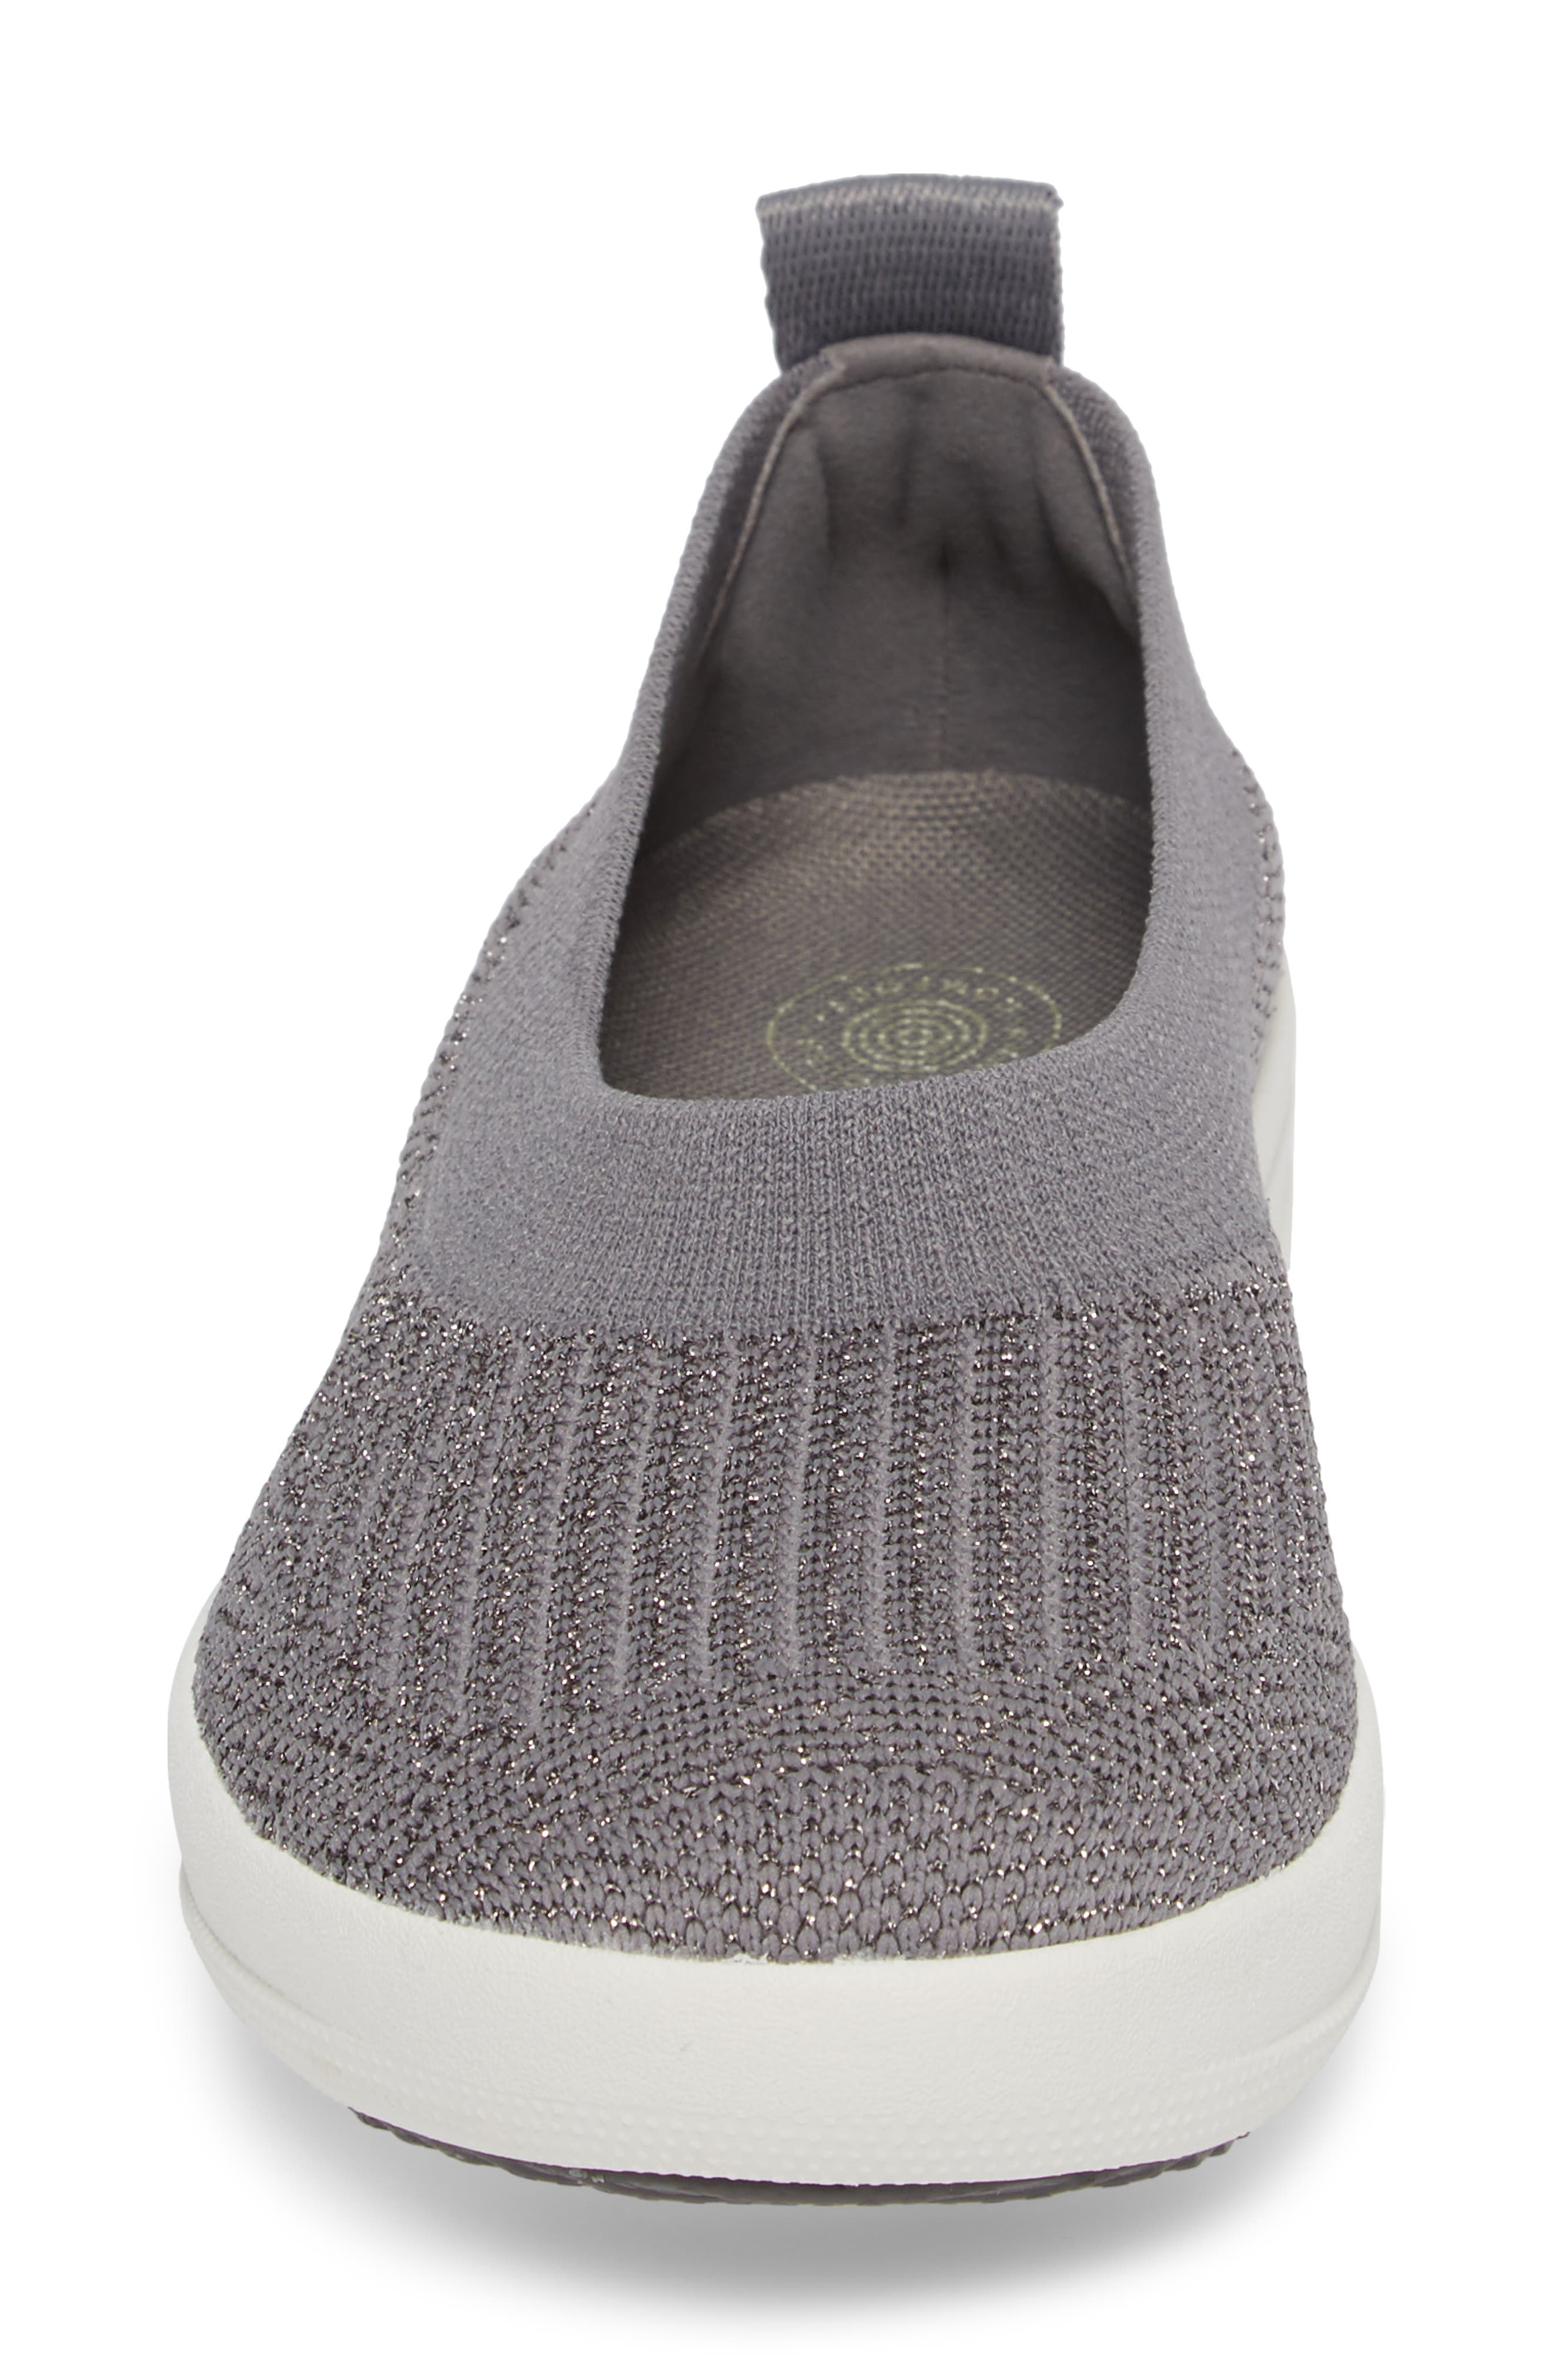 Uberknit<sup>™</sup> Slip-On Ballerina Sneaker,                             Alternate thumbnail 4, color,                             Charcoal/ Metallic Pewter